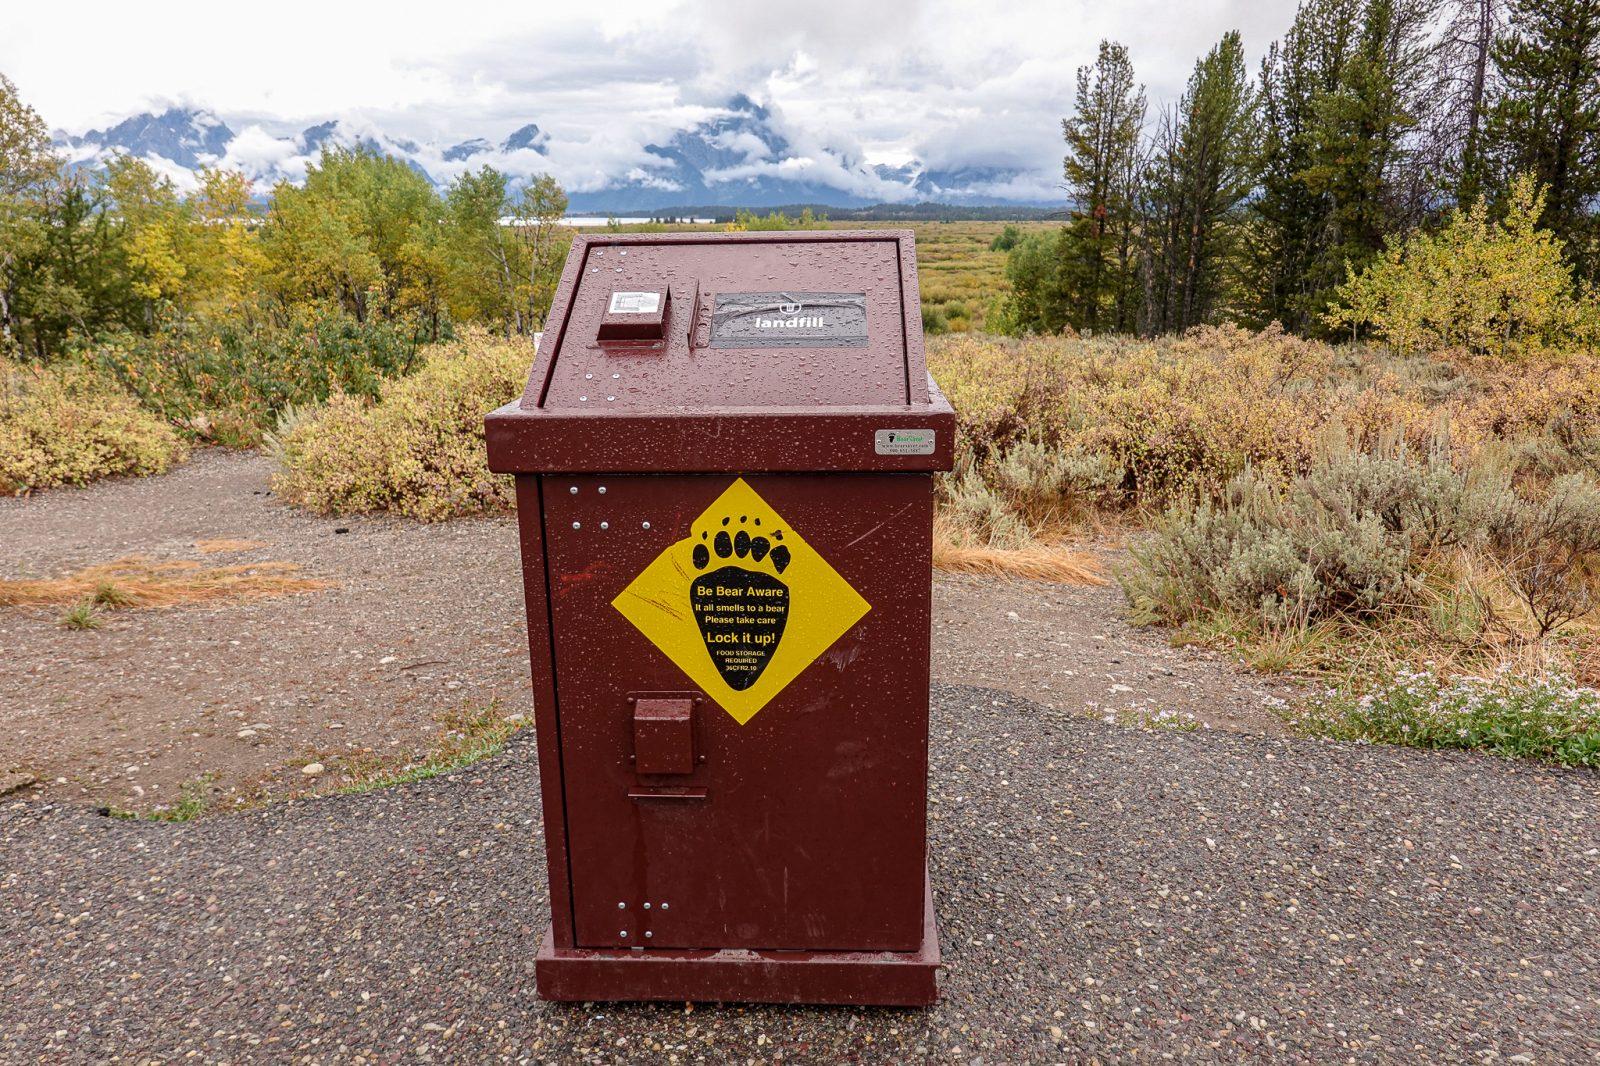 søppelkasse med bjørnesikring